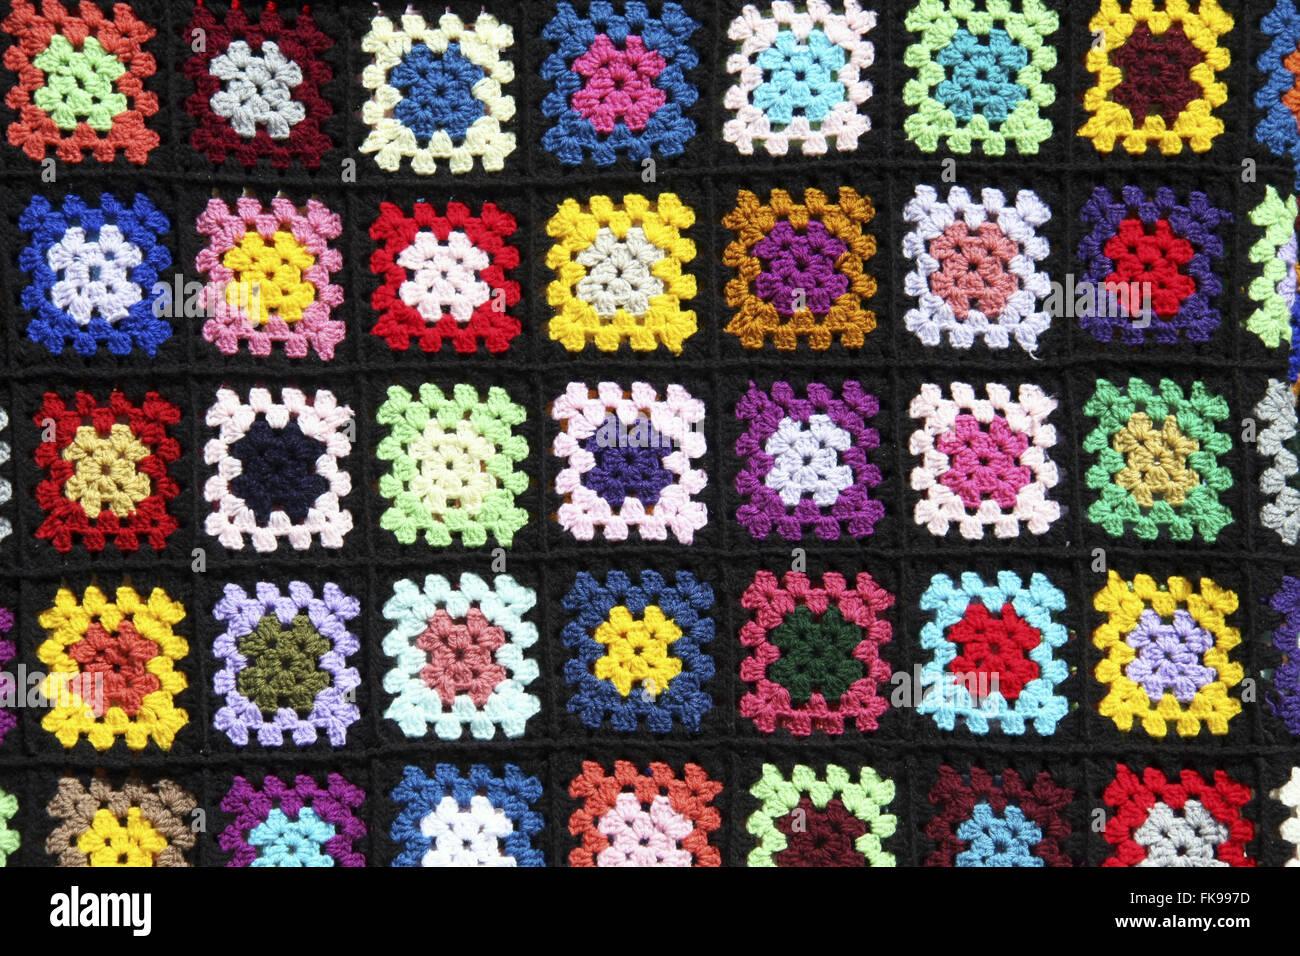 Crochet crafts produced in the municipality of Banana plantation - Vale do Paraiba - Stock Image